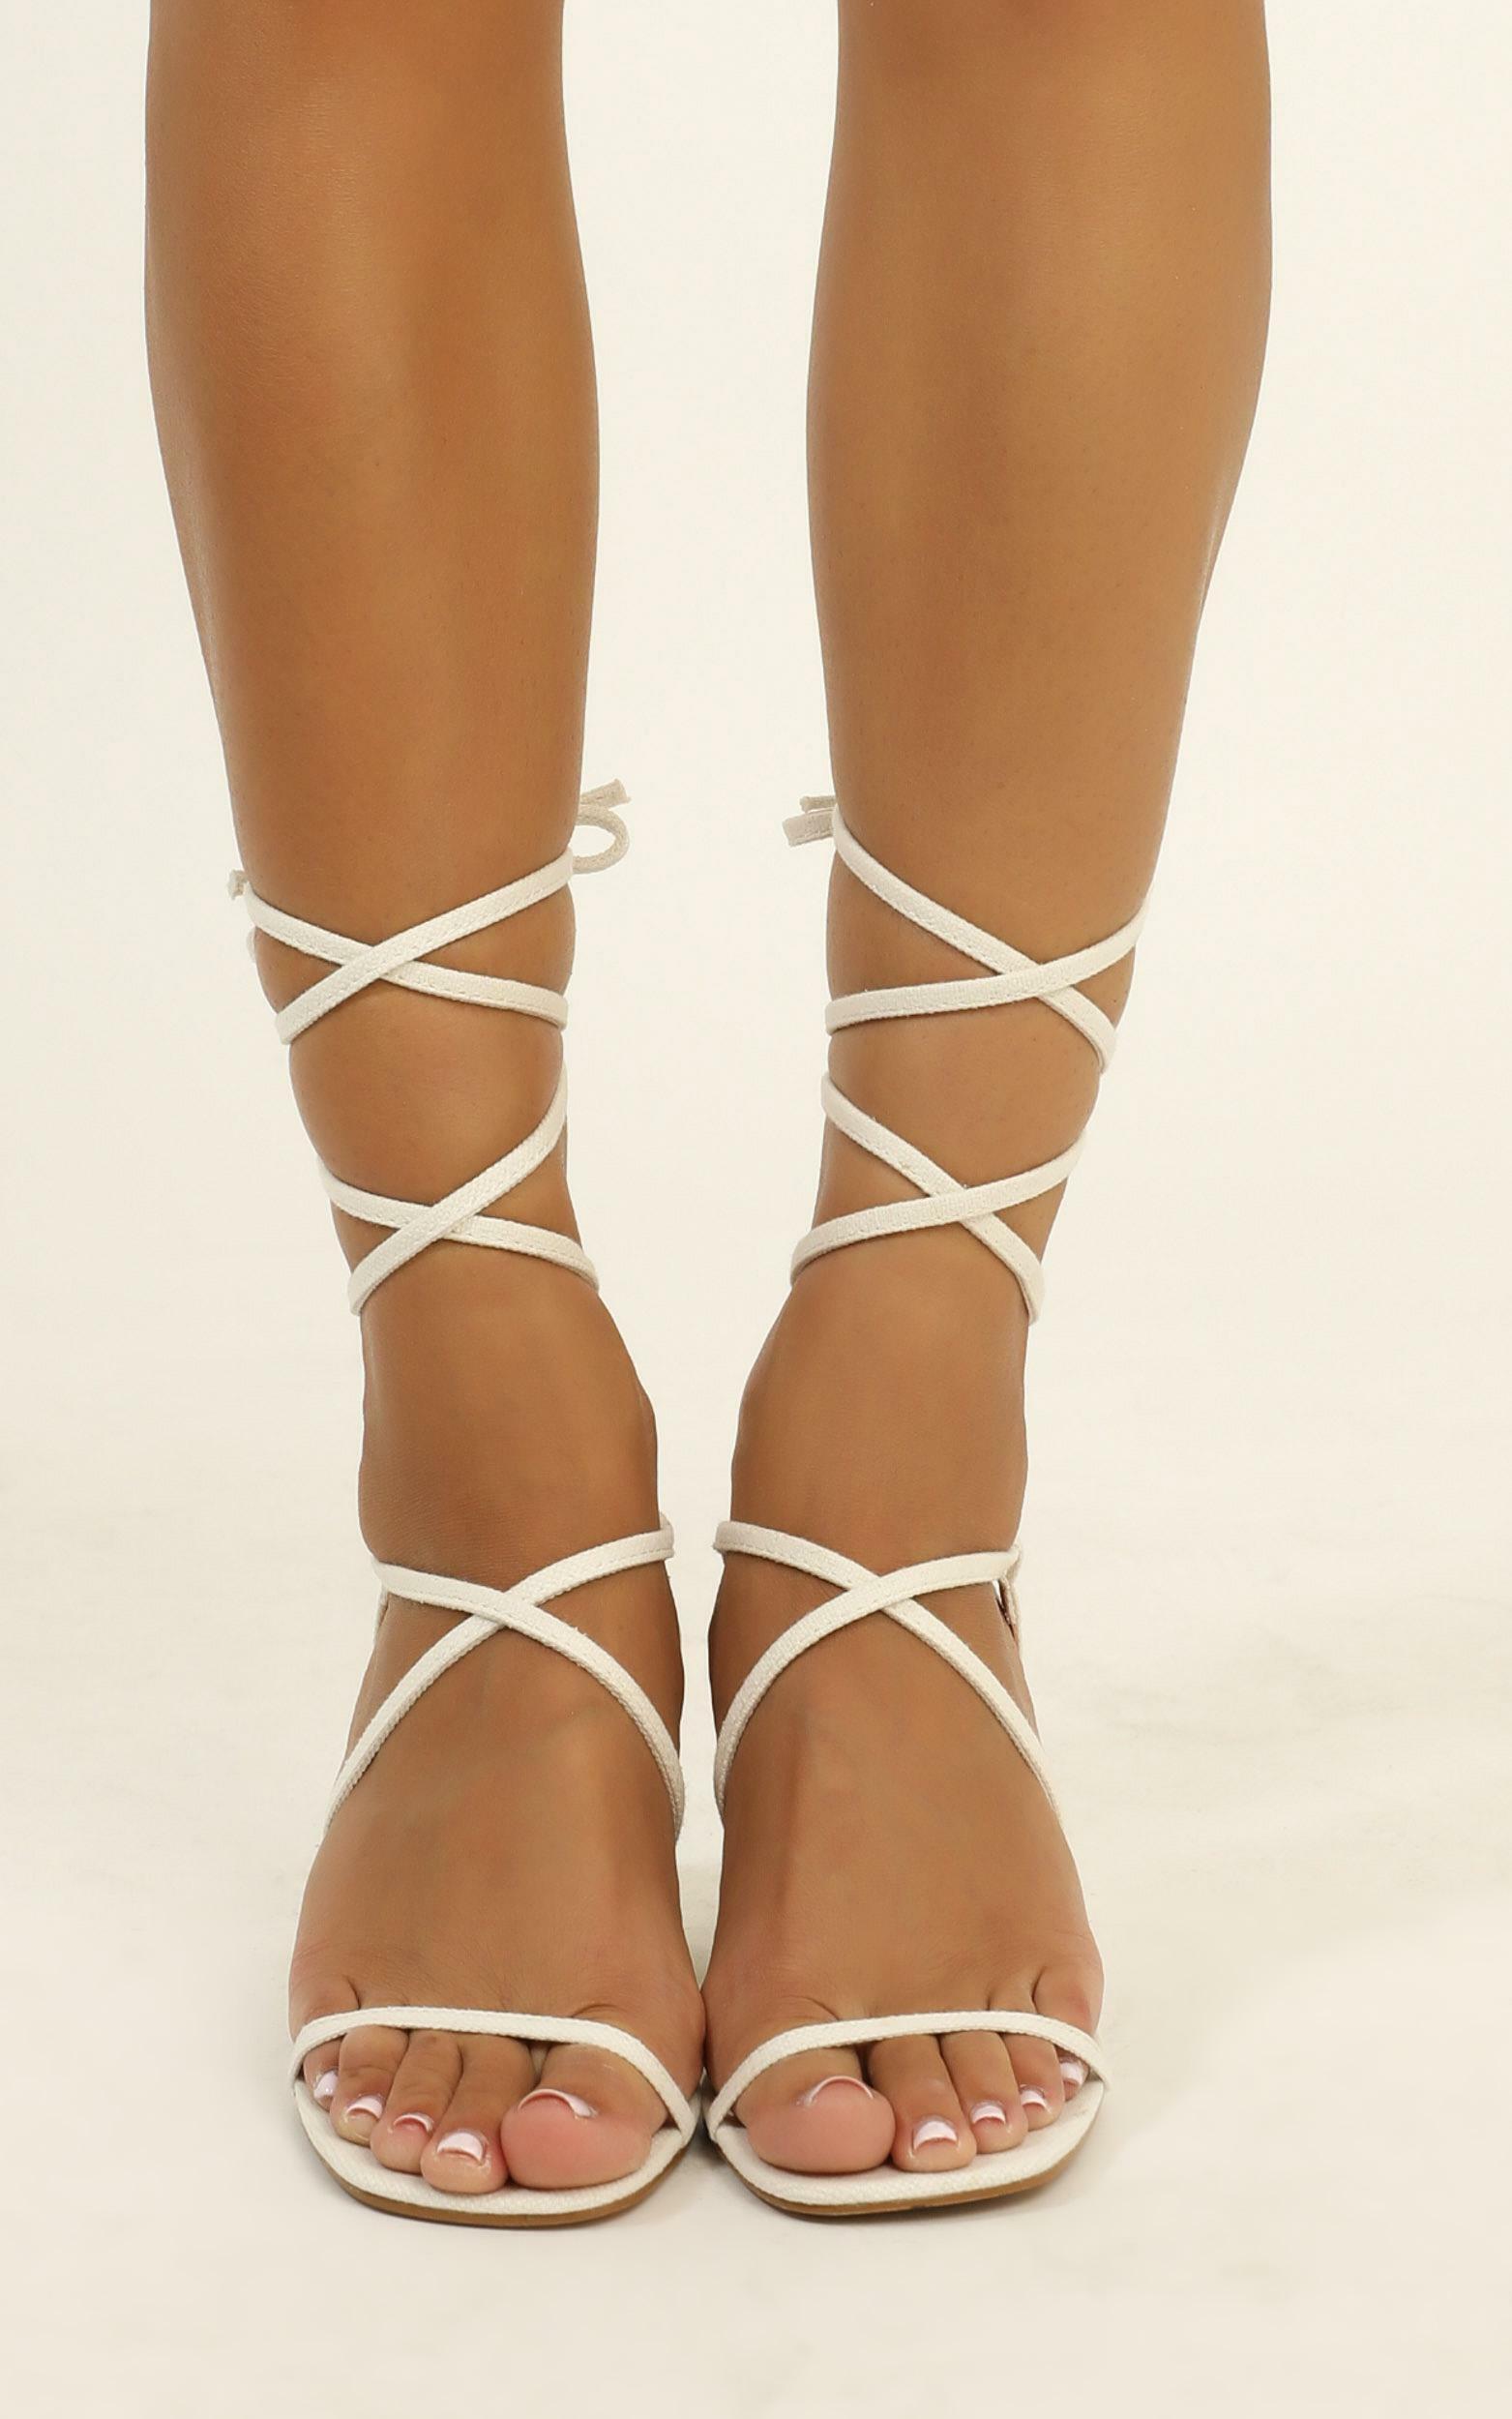 Billini - Yolanda heels in white linen - 10, Taupe, hi-res image number null